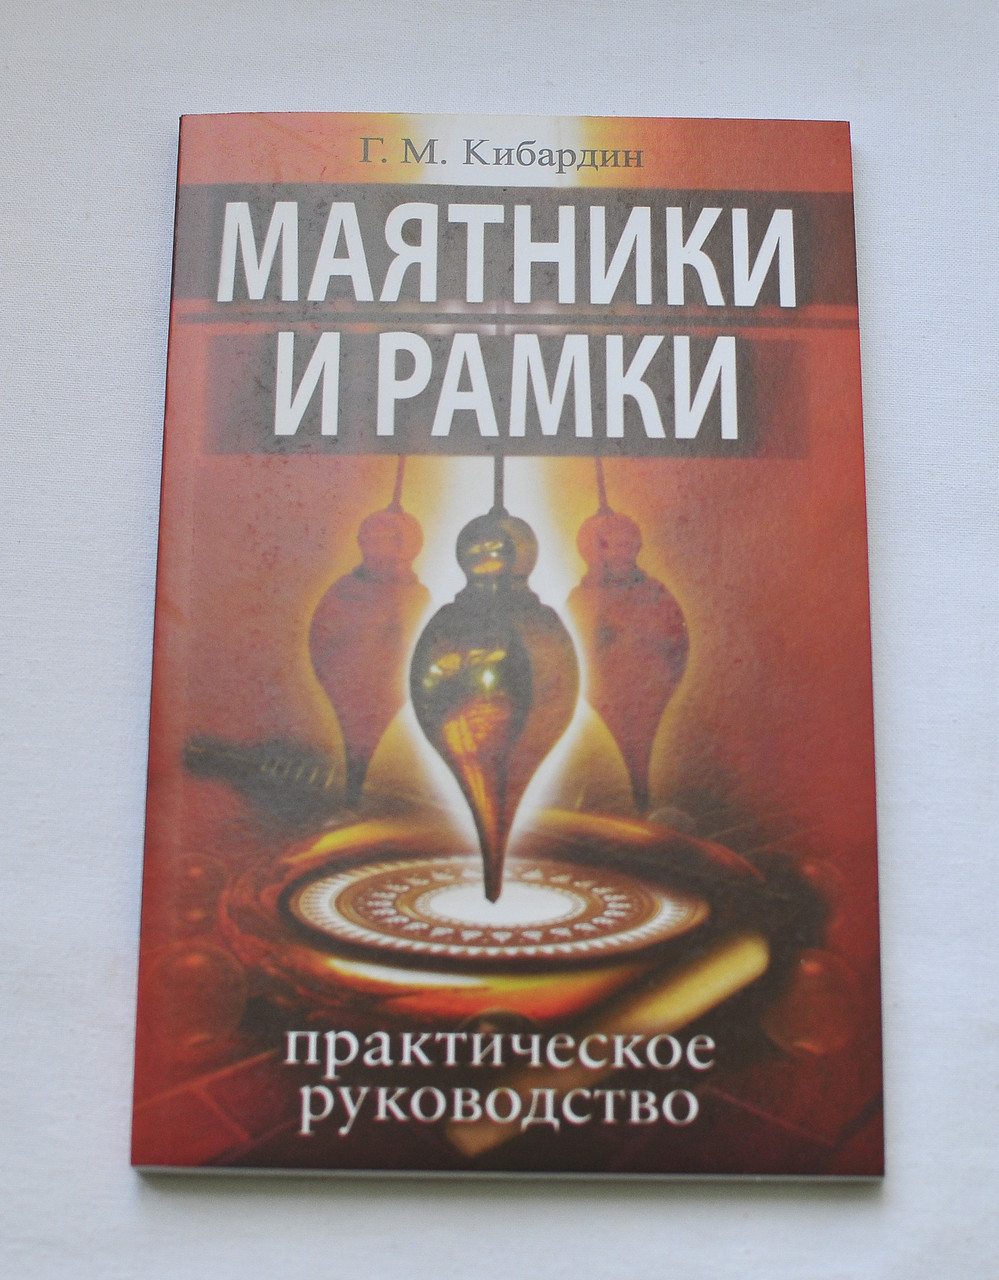 Маятники і рамки Практичне керівництво, Кибардин Р. М. (книга)